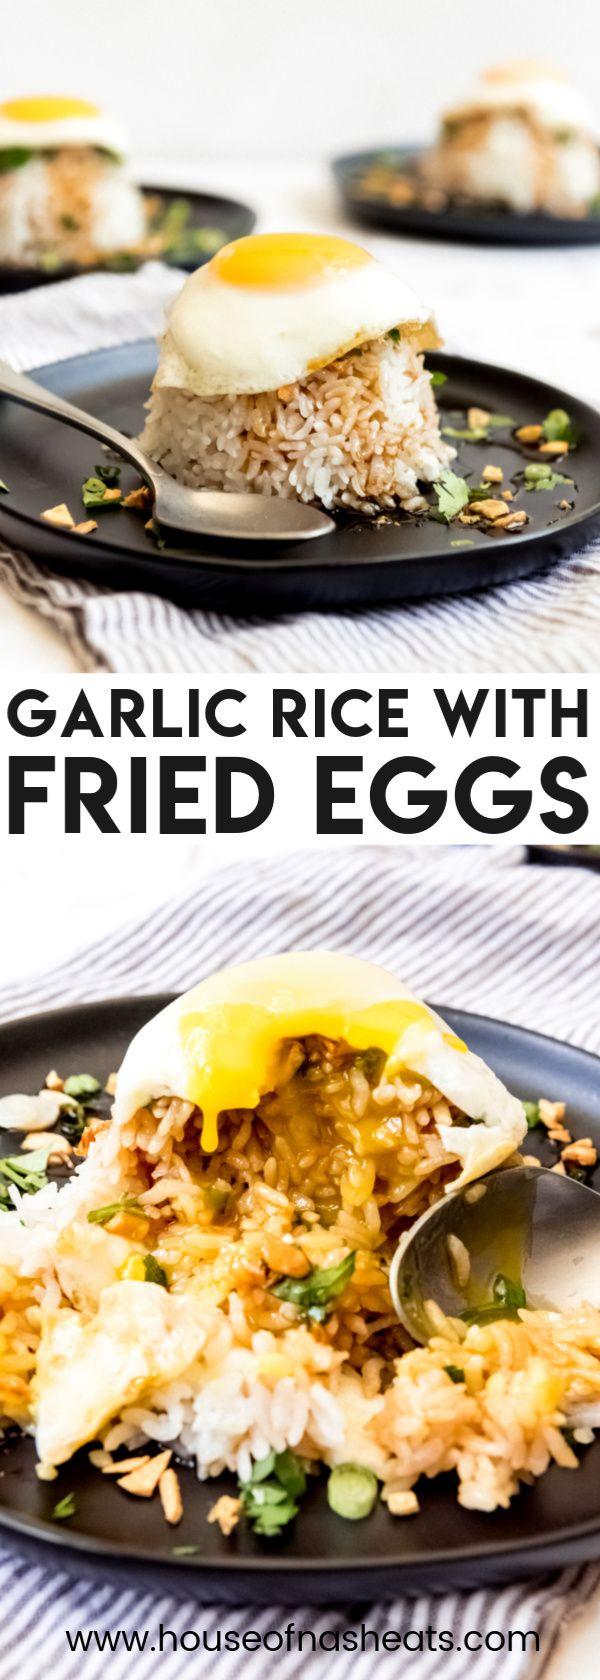 Crispy Garlic Sticky Rice with Fried Egg - House of Nash Eats